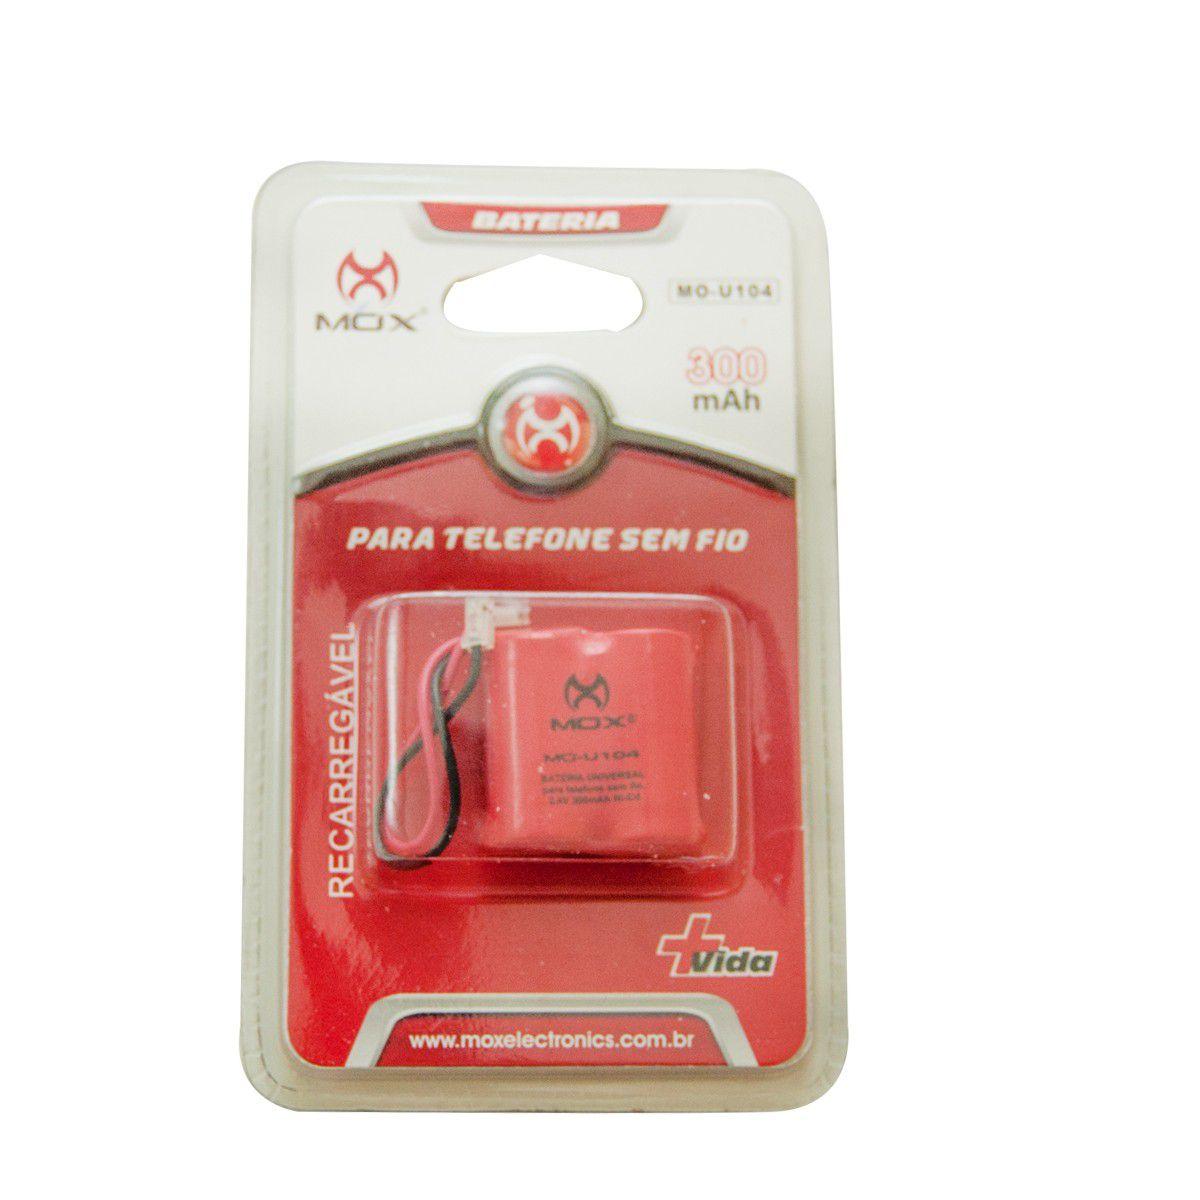 Bateria Telefone Sem Fio Mox Mo-U104 300 Mah Plug Universal